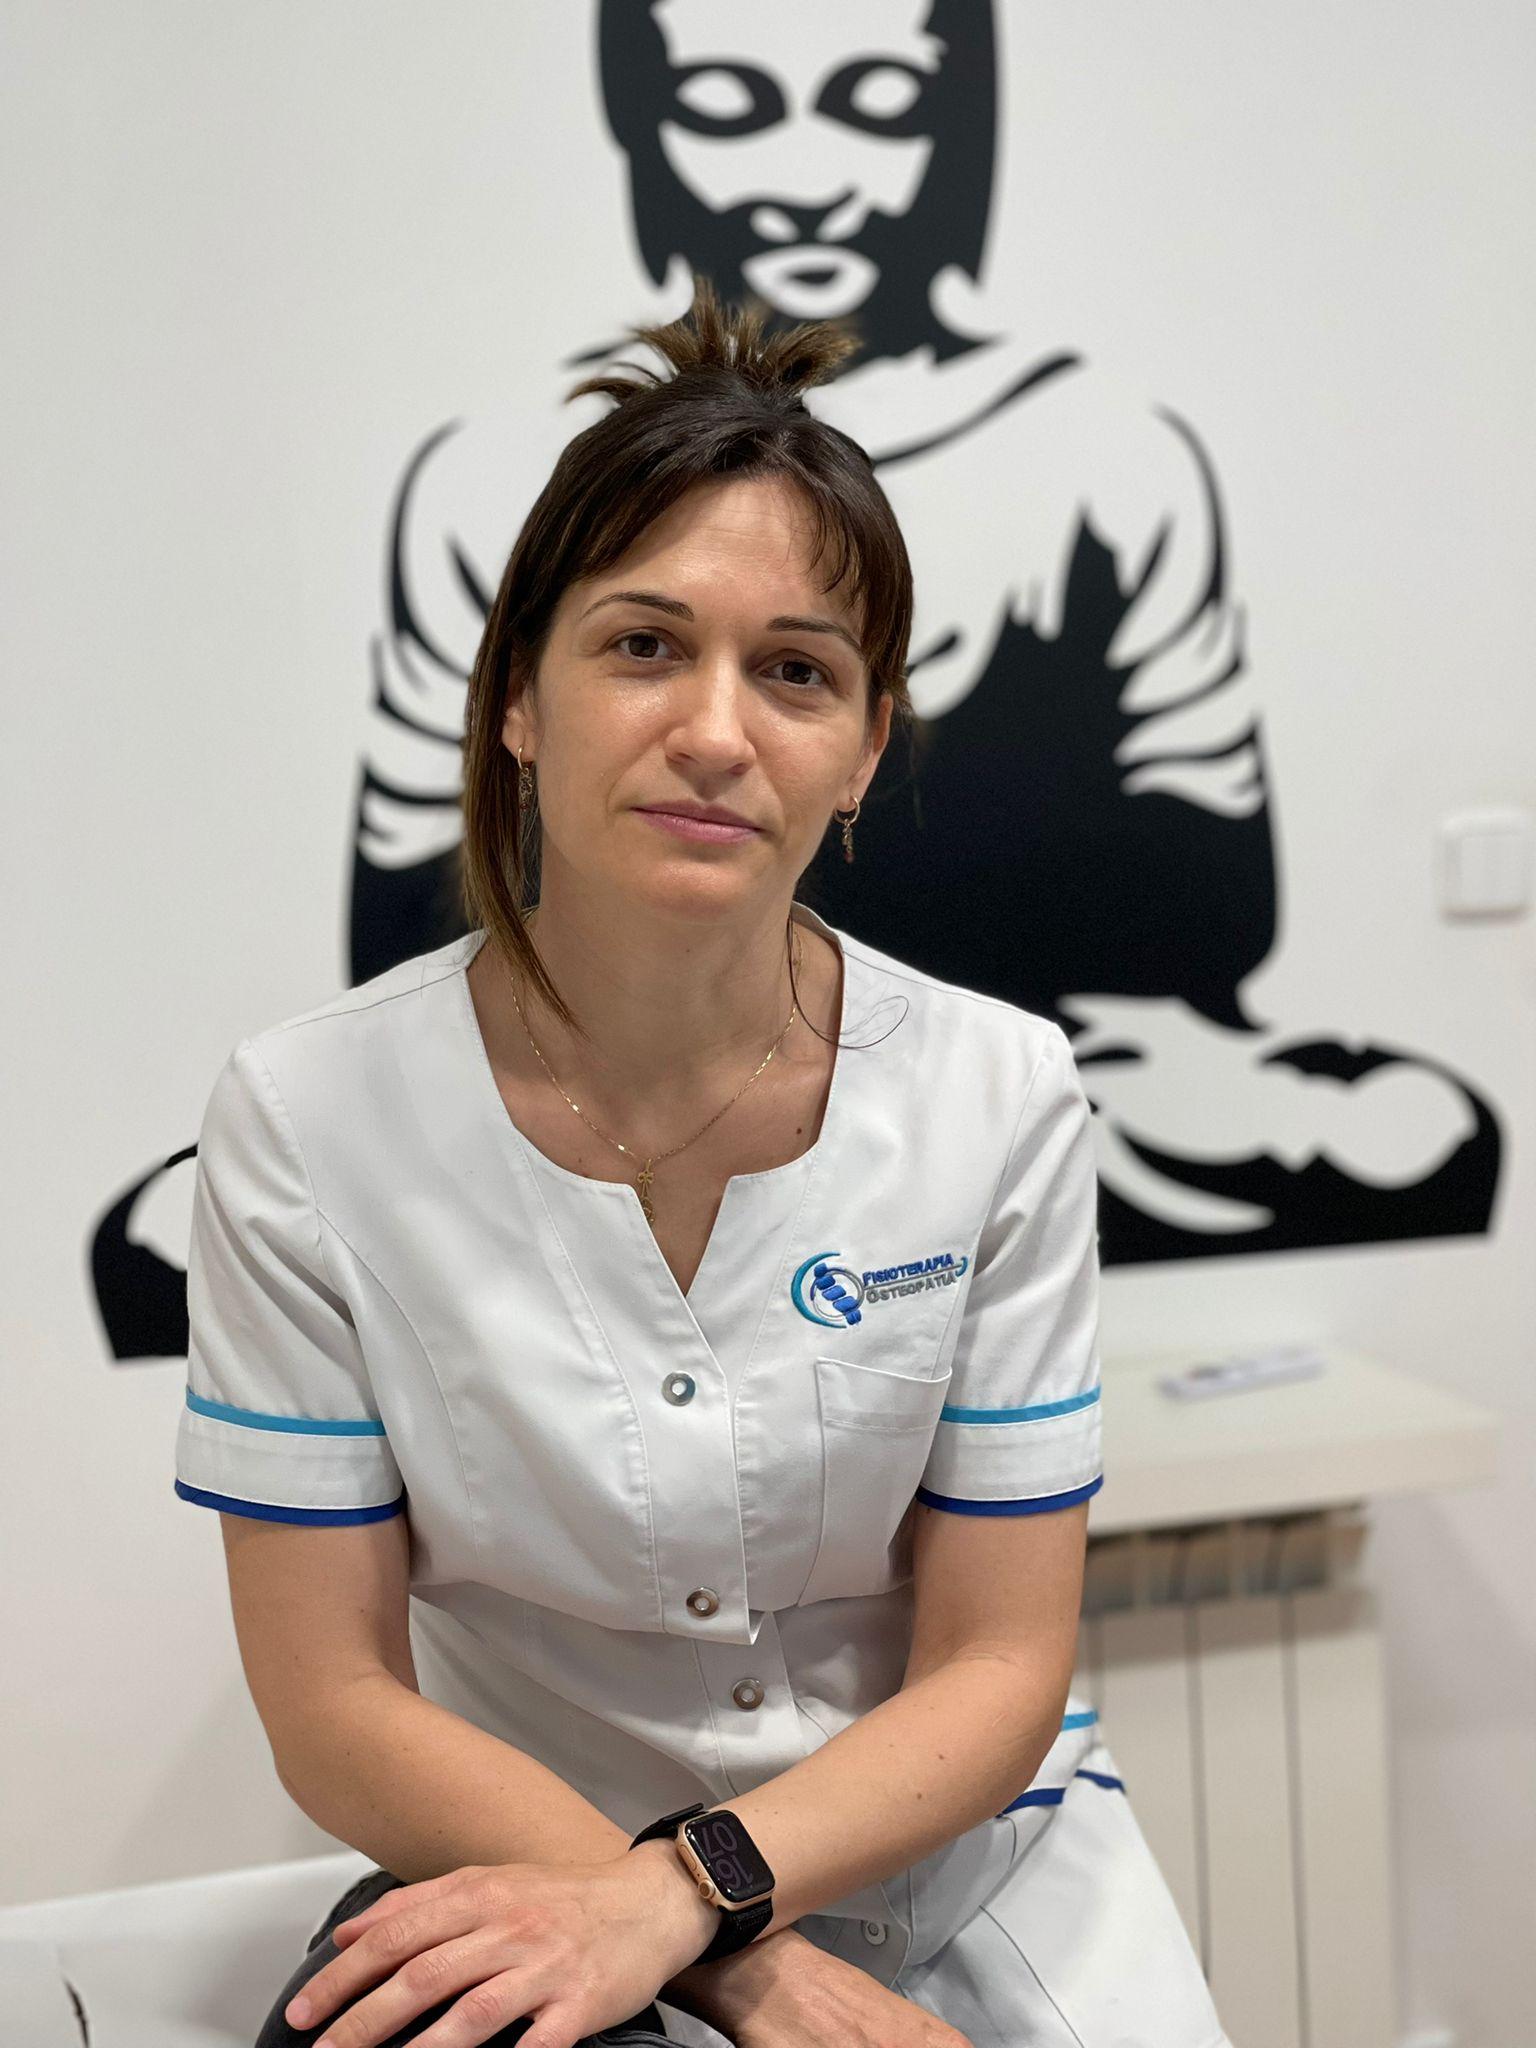 Sònia Carbonell